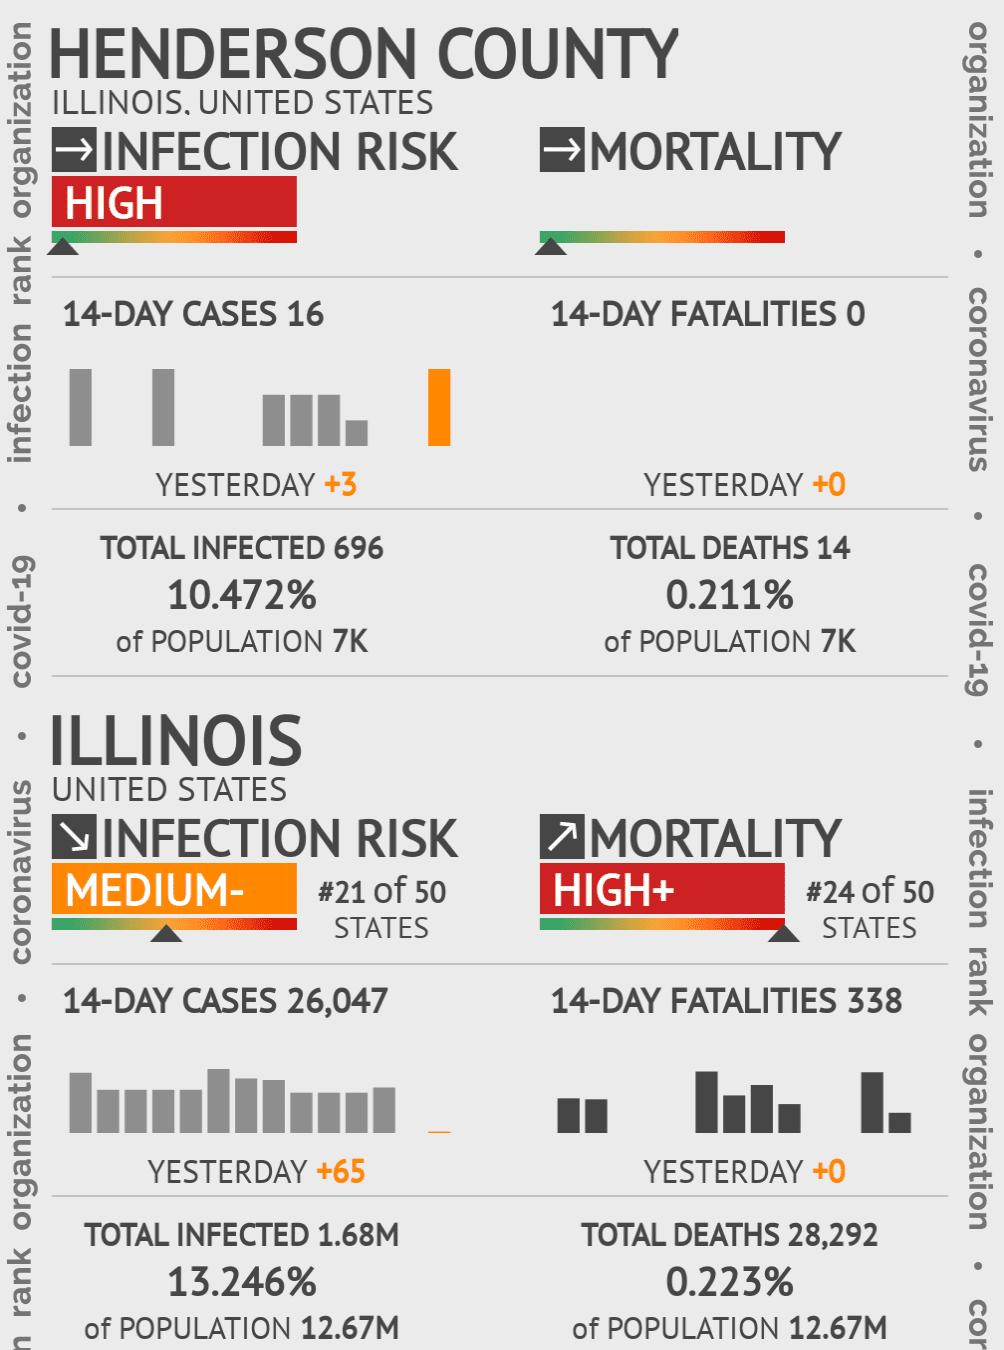 Henderson County Coronavirus Covid-19 Risk of Infection on November 30, 2020